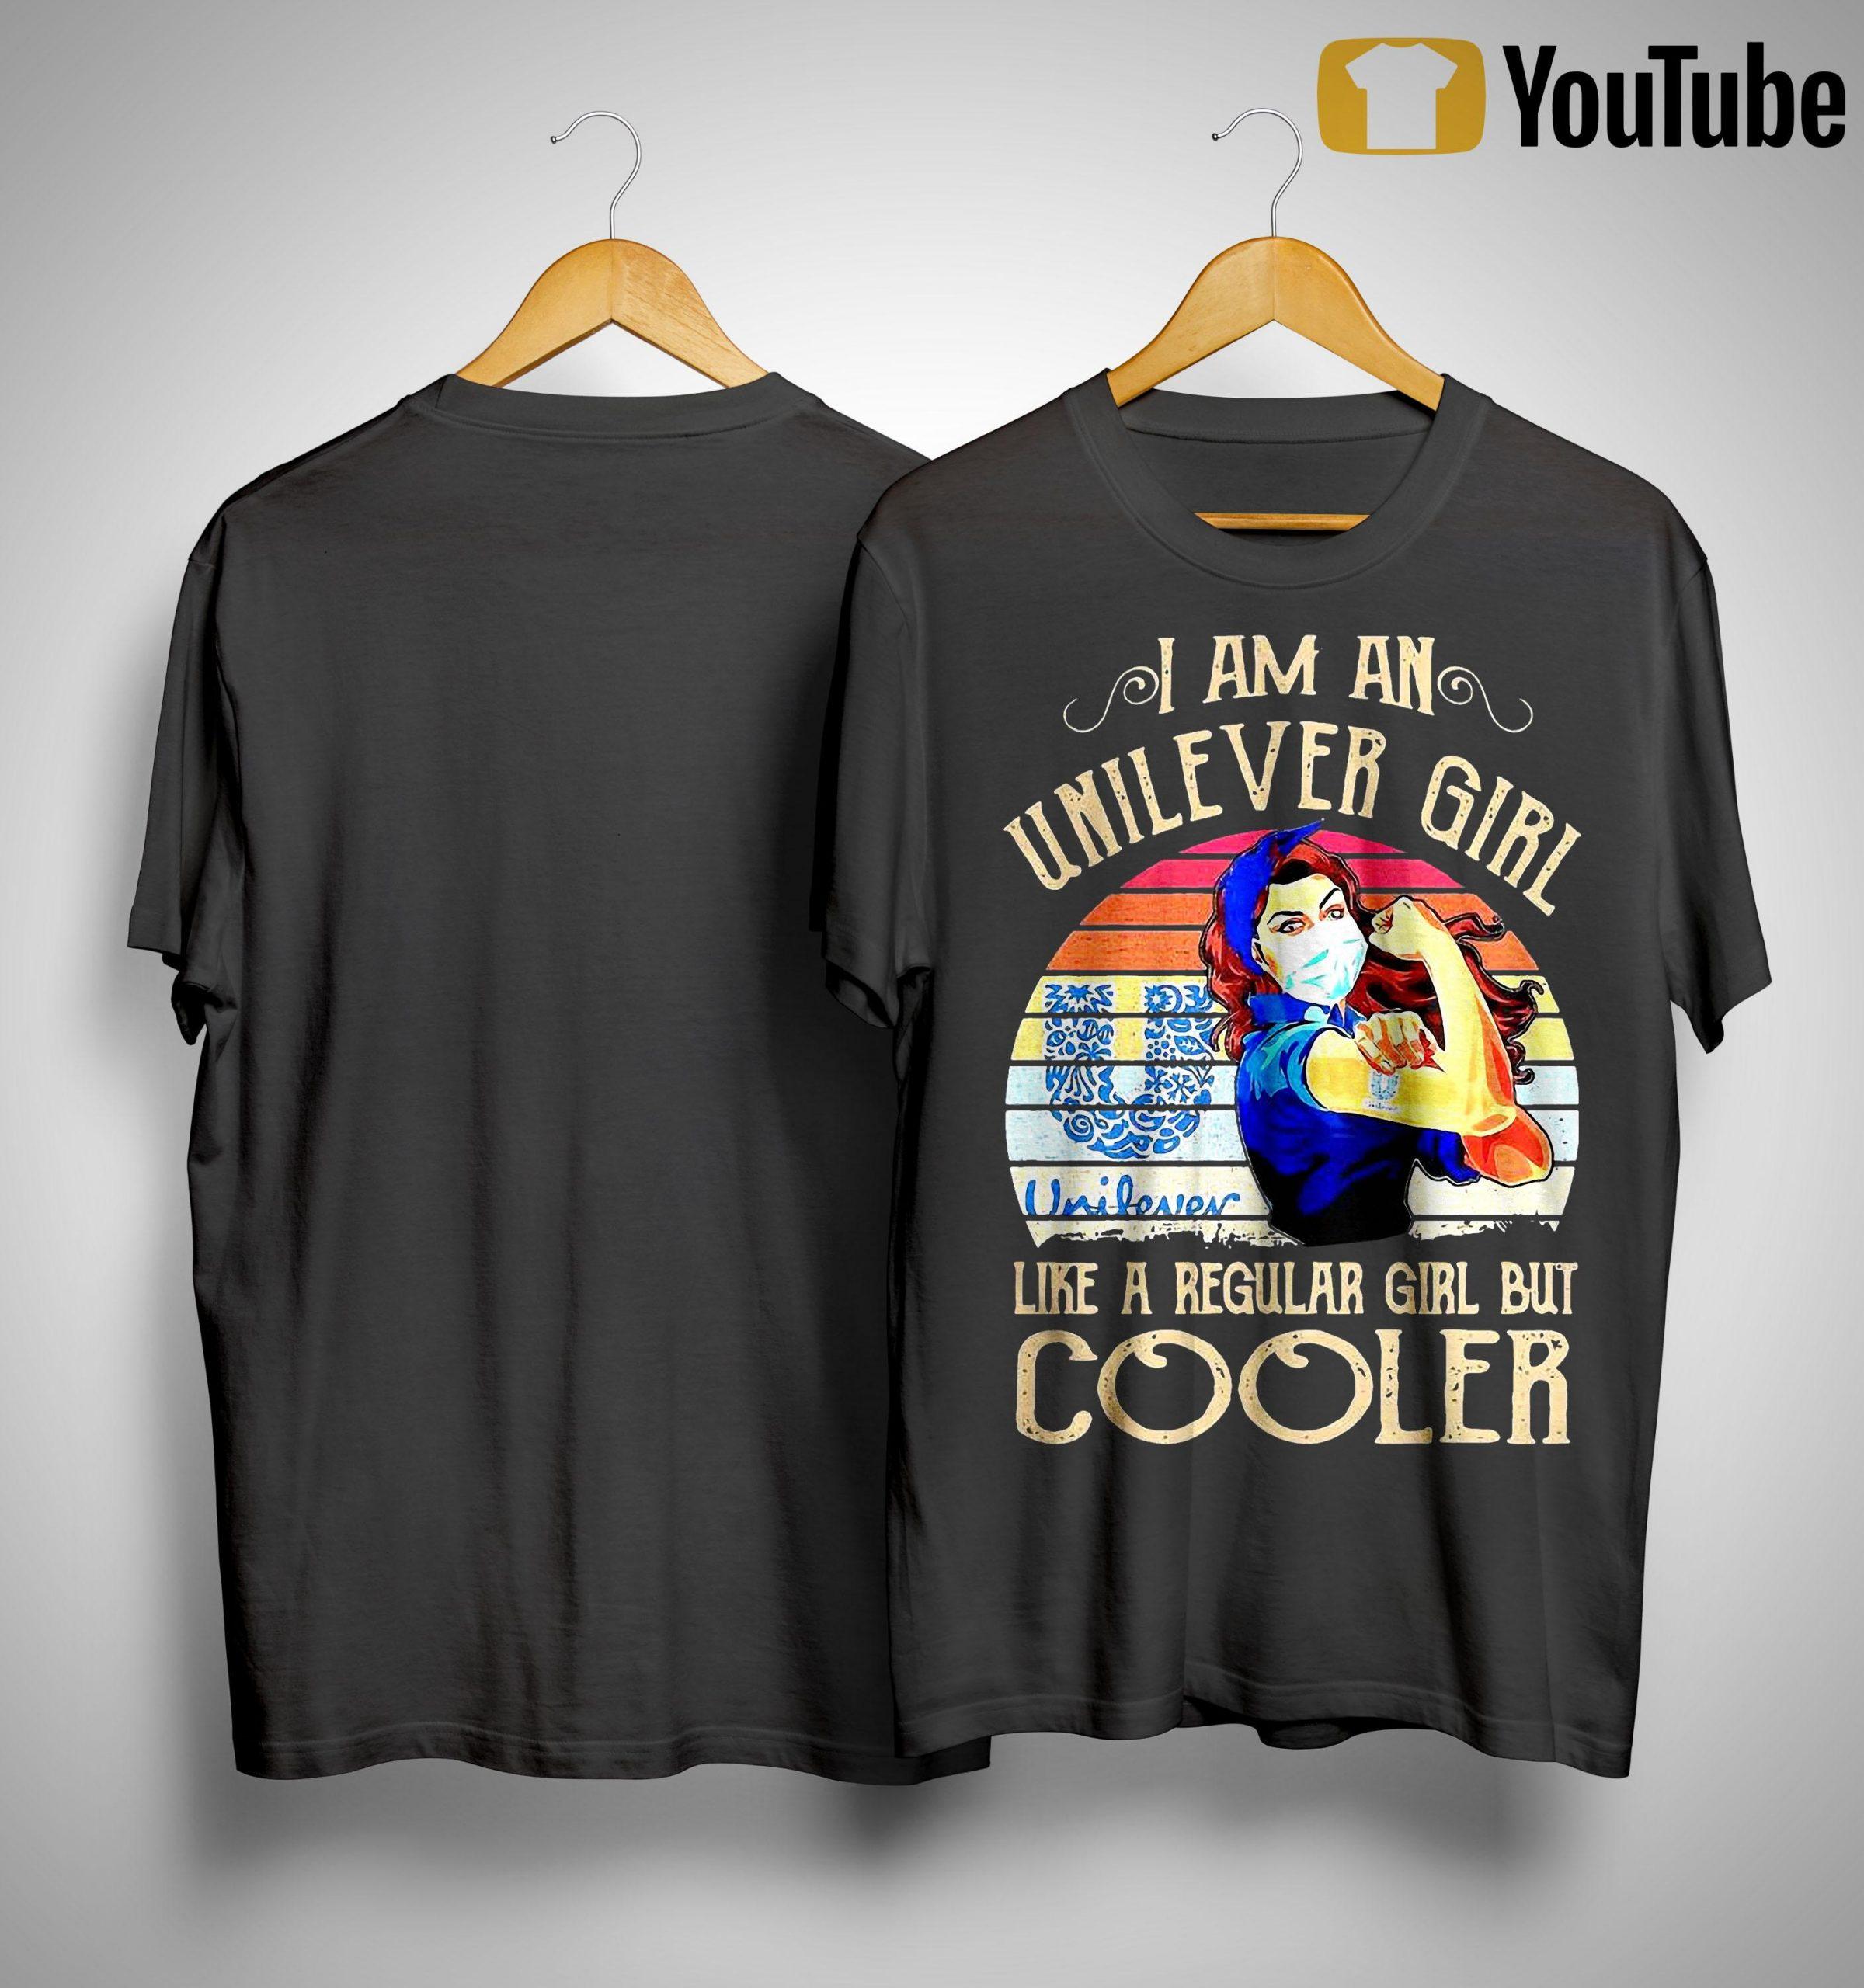 Vintage I Am An Unilever Girl Like A Regular Girl But Cooler Shirt